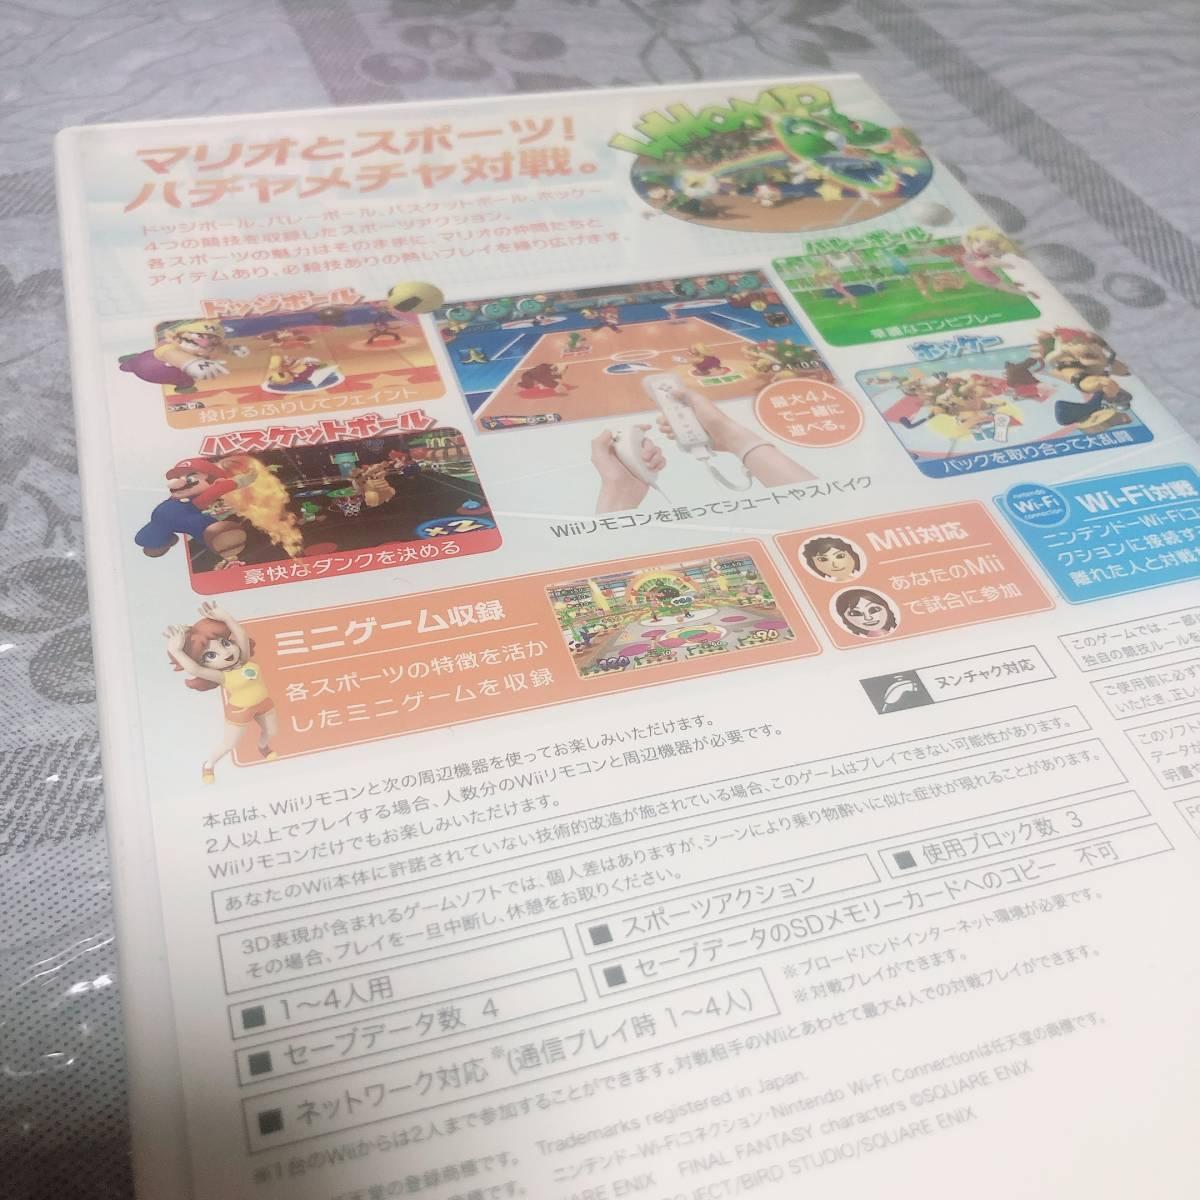 Wii マリオスポーツミックス ゲームソフト 説明書付き